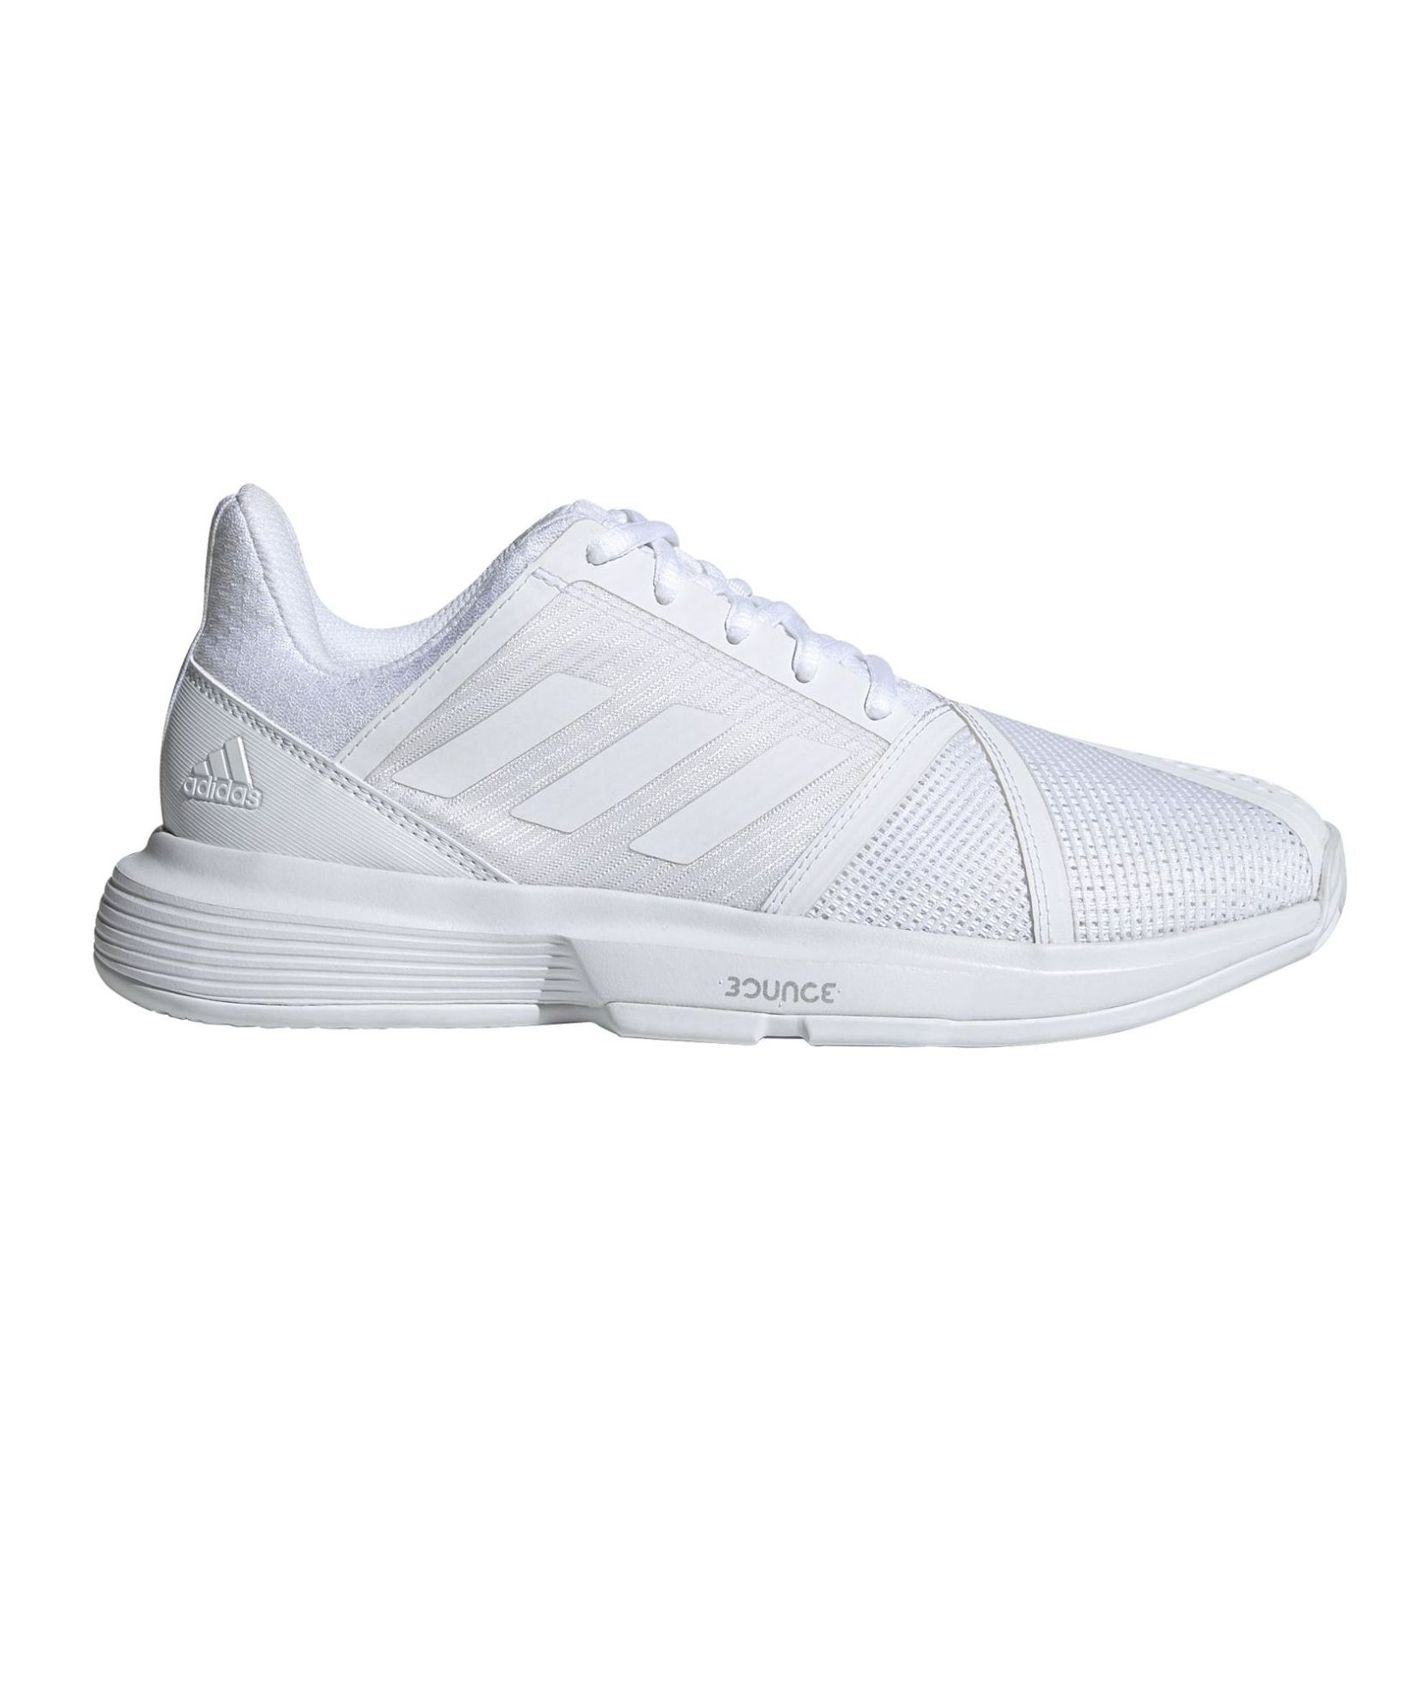 zapatillas padel asics blanca mujer